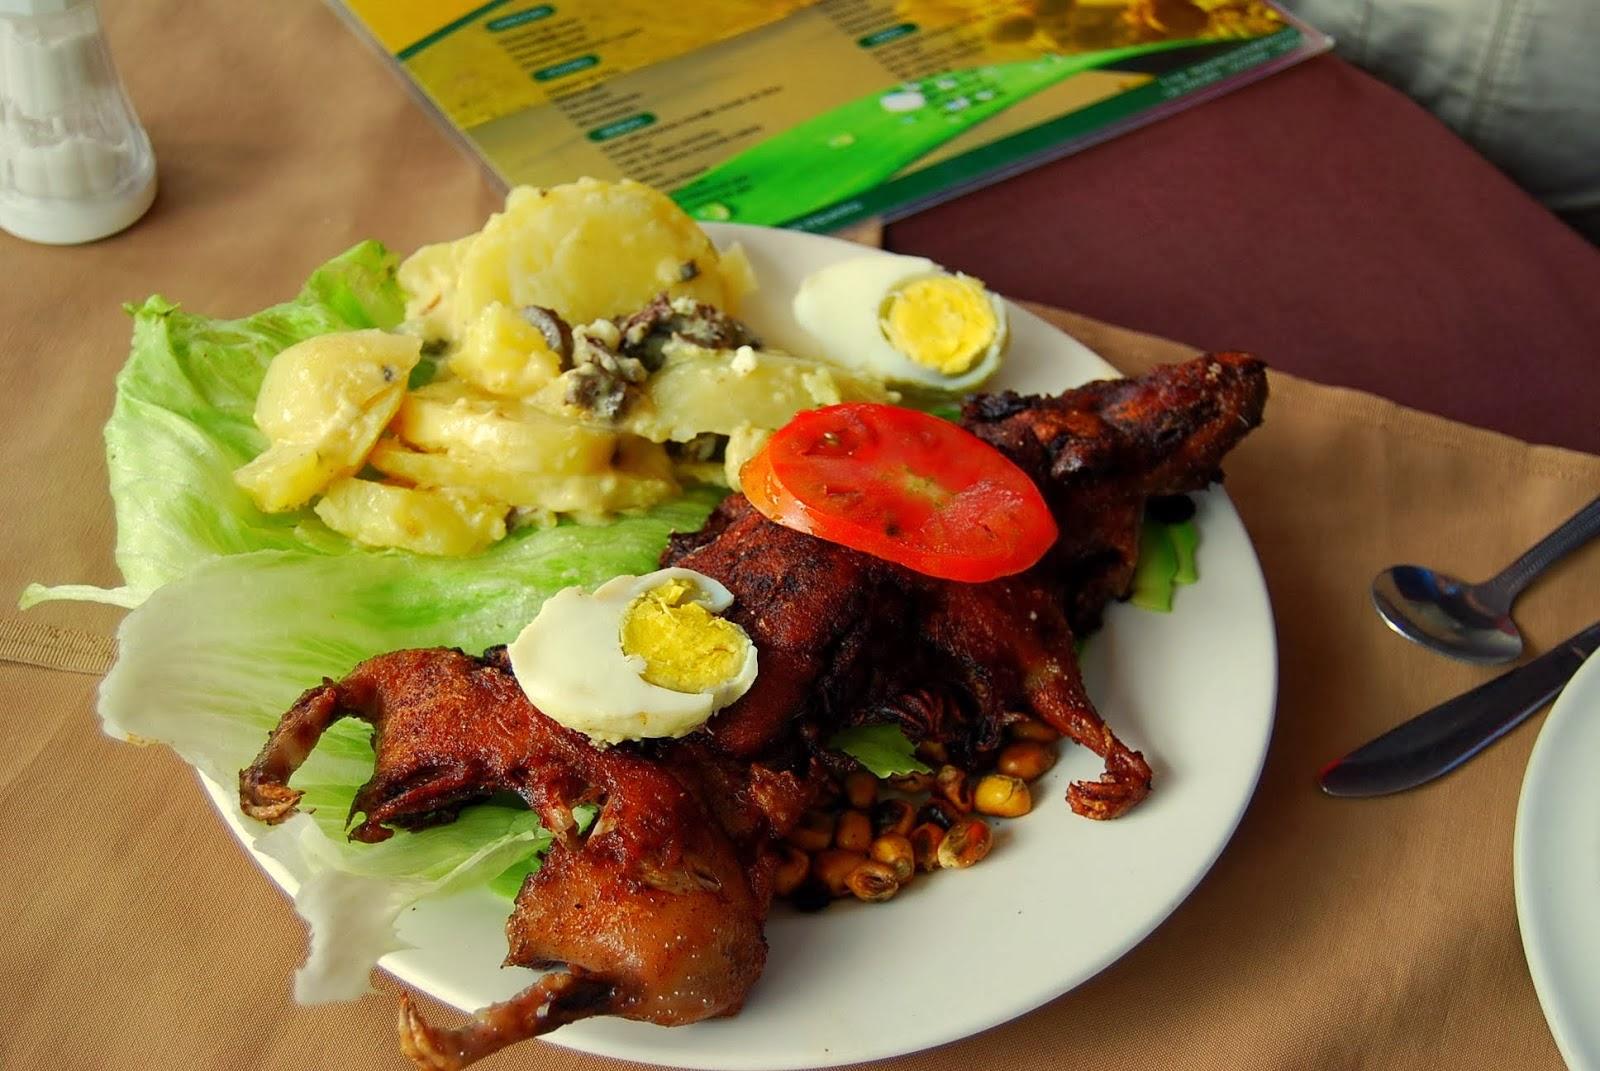 galapagos islands information ecuador cruises tours exotic ecuadorian food cuisine. Black Bedroom Furniture Sets. Home Design Ideas